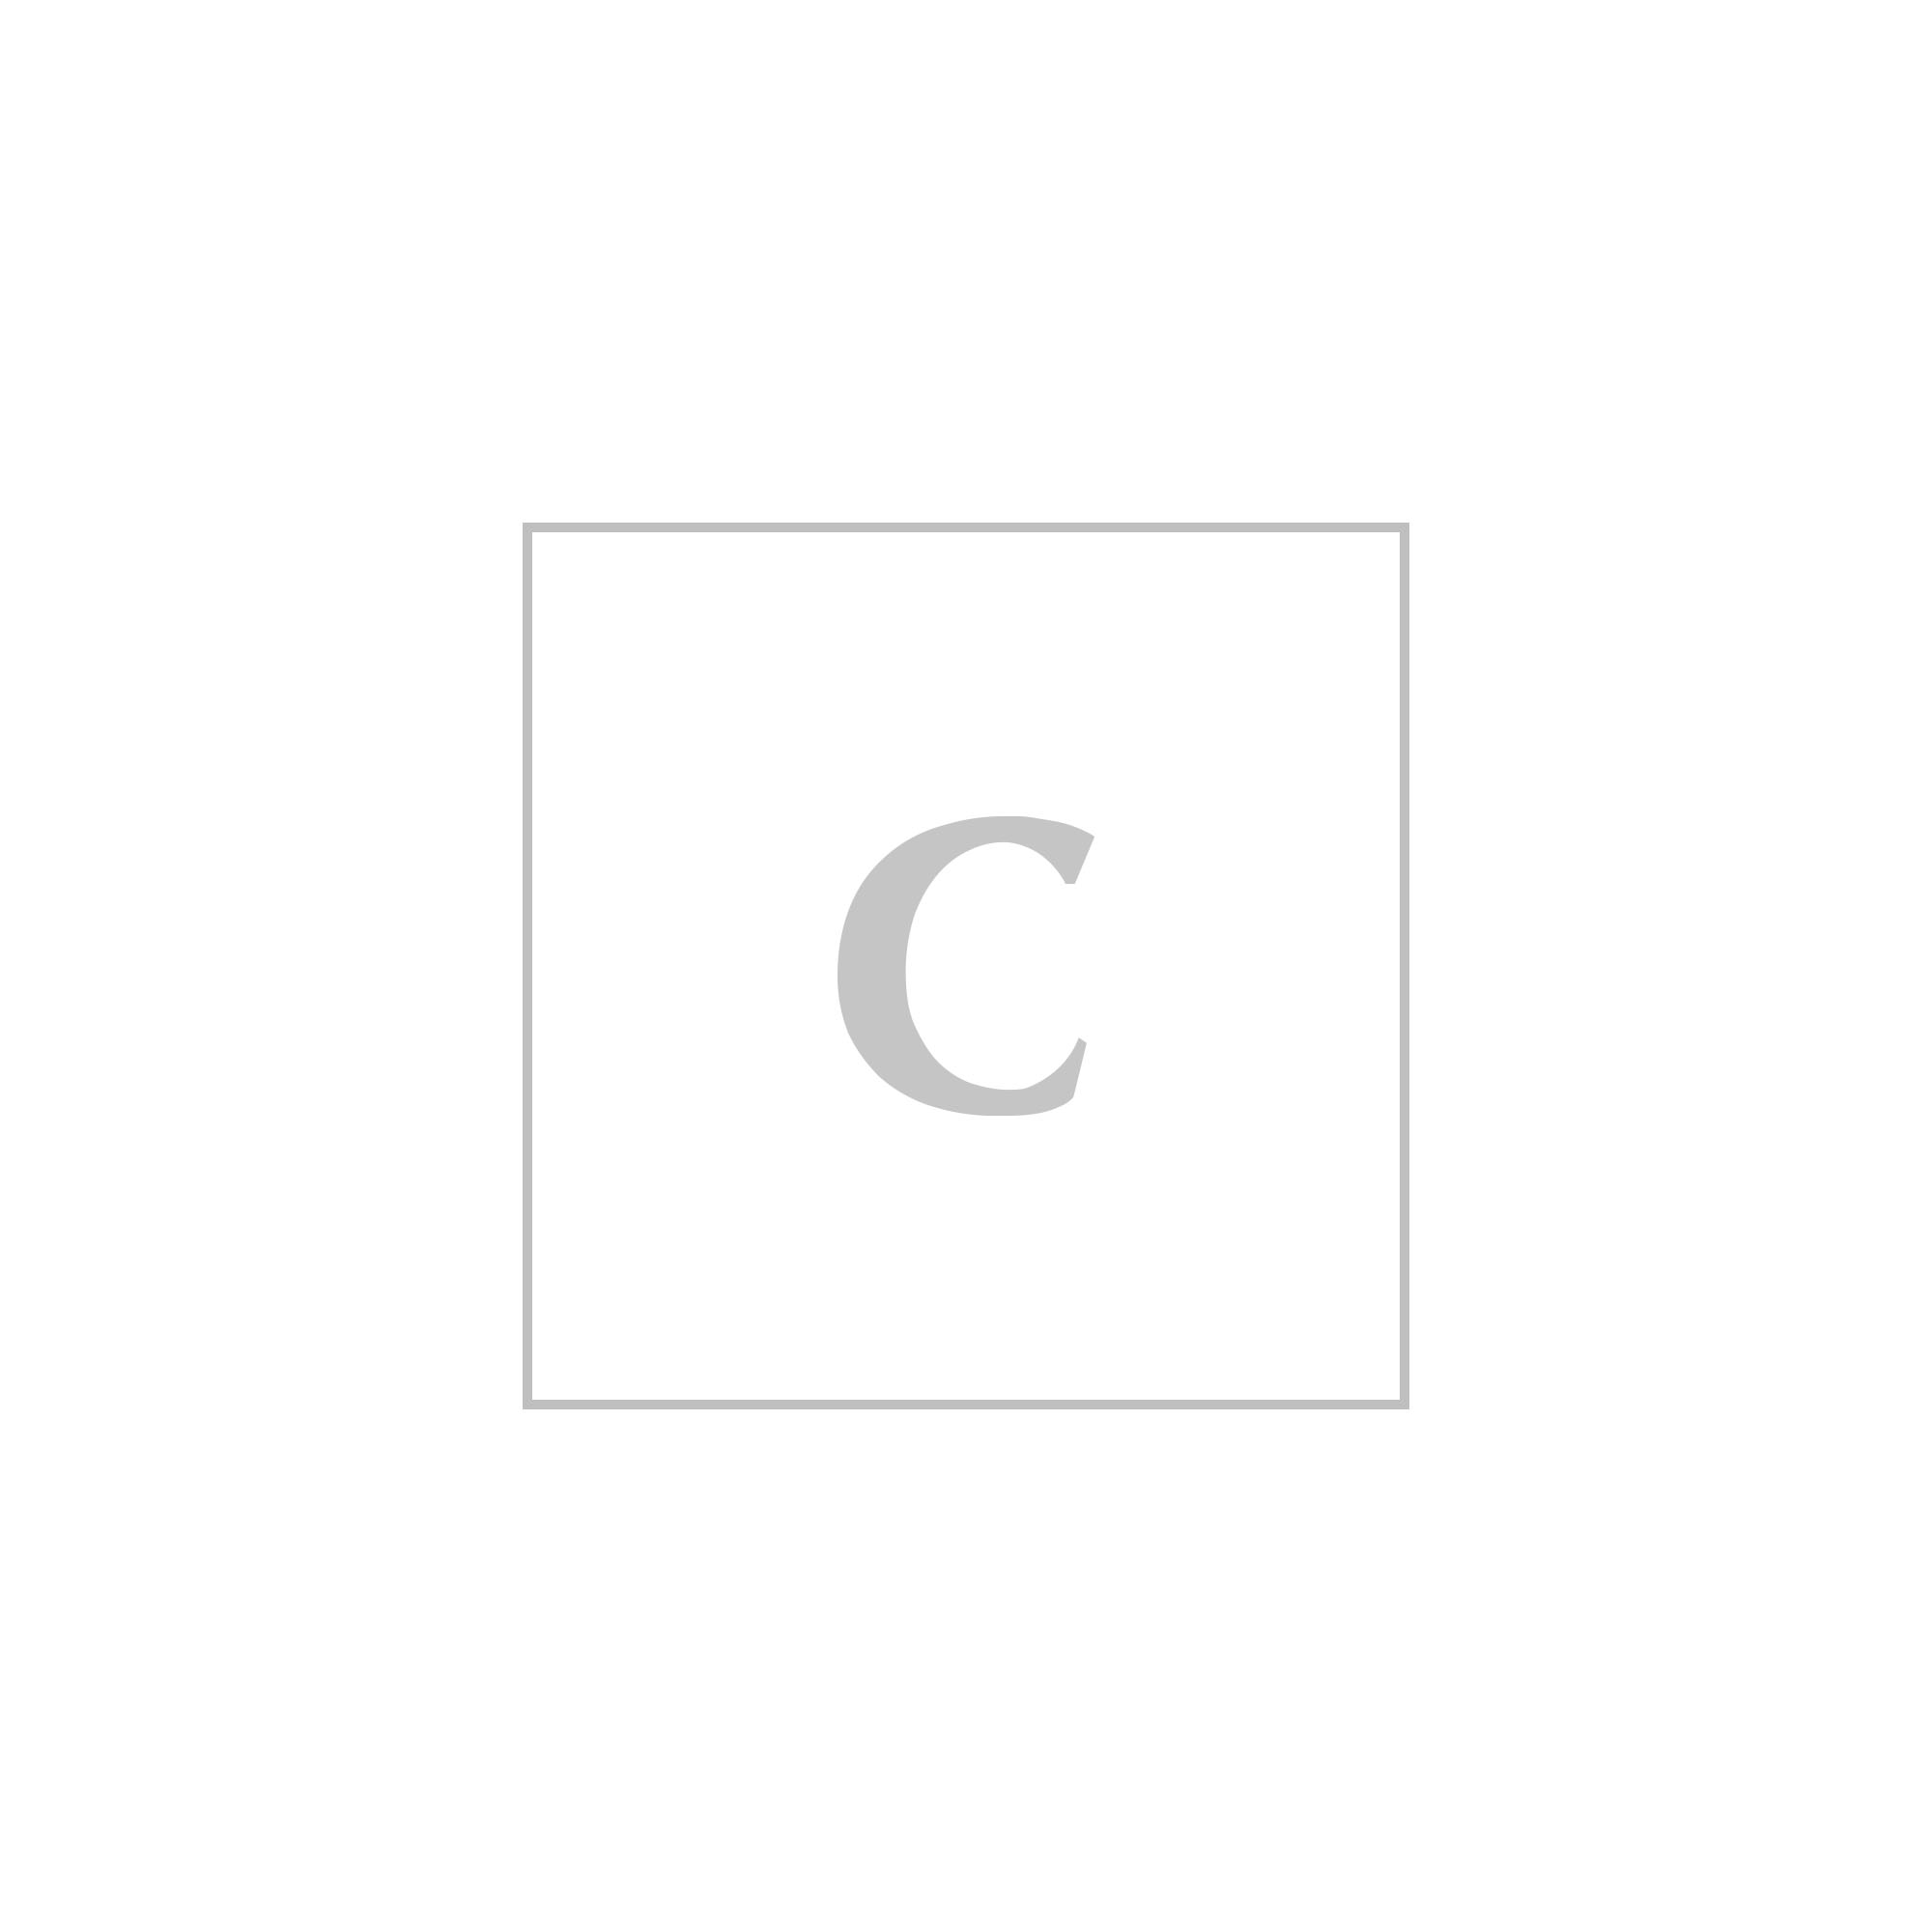 Stella mccartney logo zip clutch